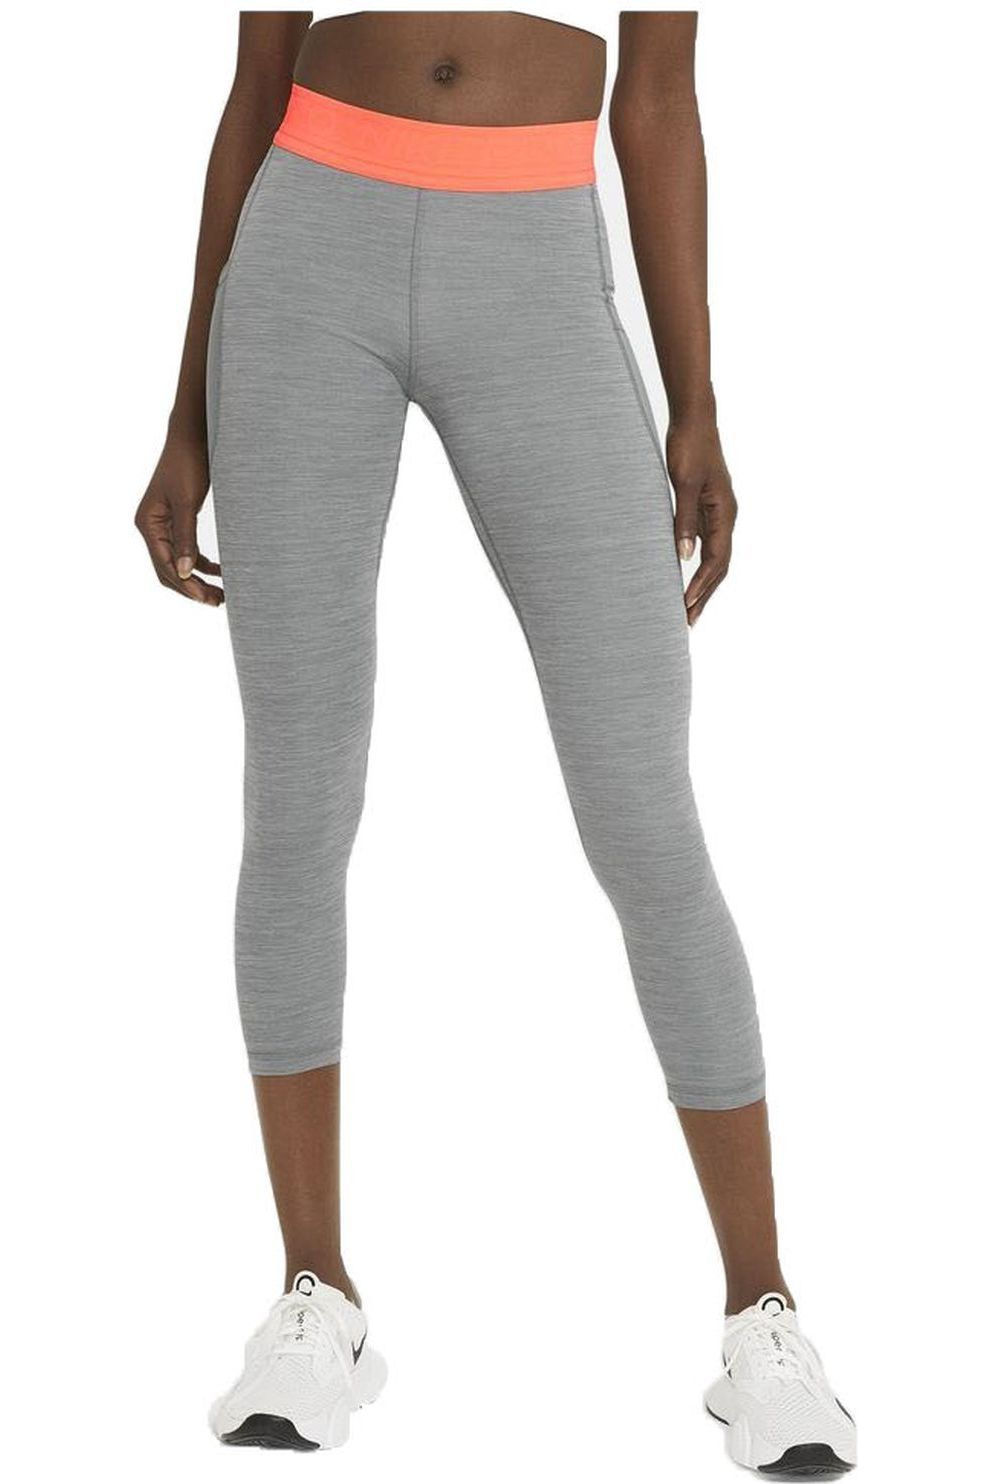 Nike Legging Pro Tight voor dames - Grijs Mengeling/Roze - Maten: XS, S, M, L